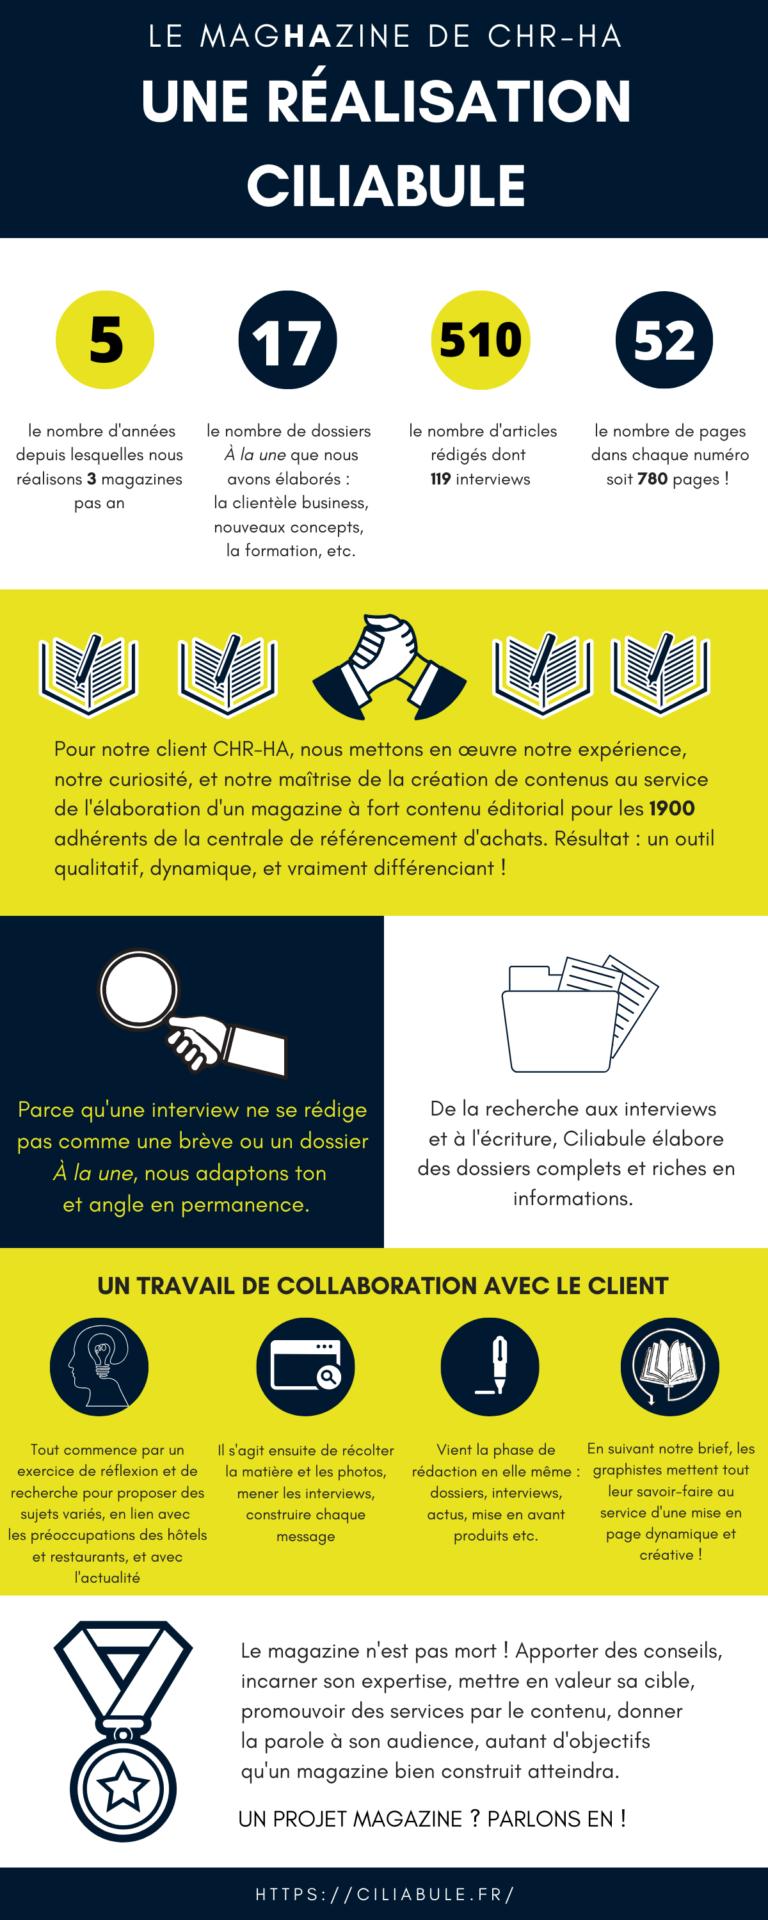 infographie-magazine-chr-ha-ciliabule